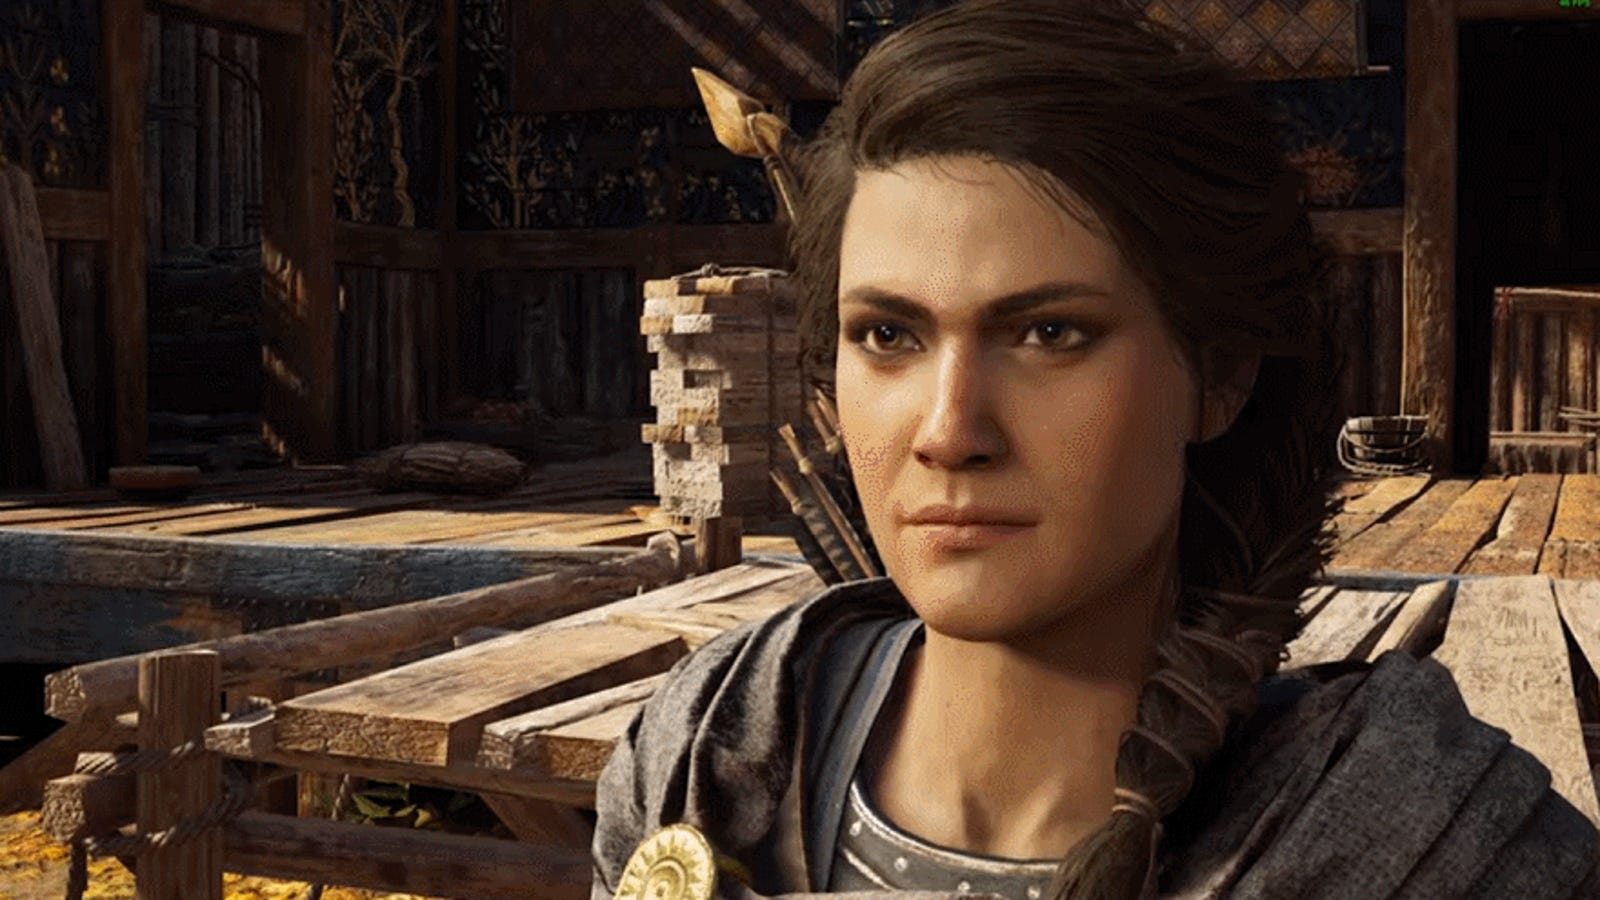 Finally, A Supercut OfAssassin's Creed Odyssey'sFavorite Cuss